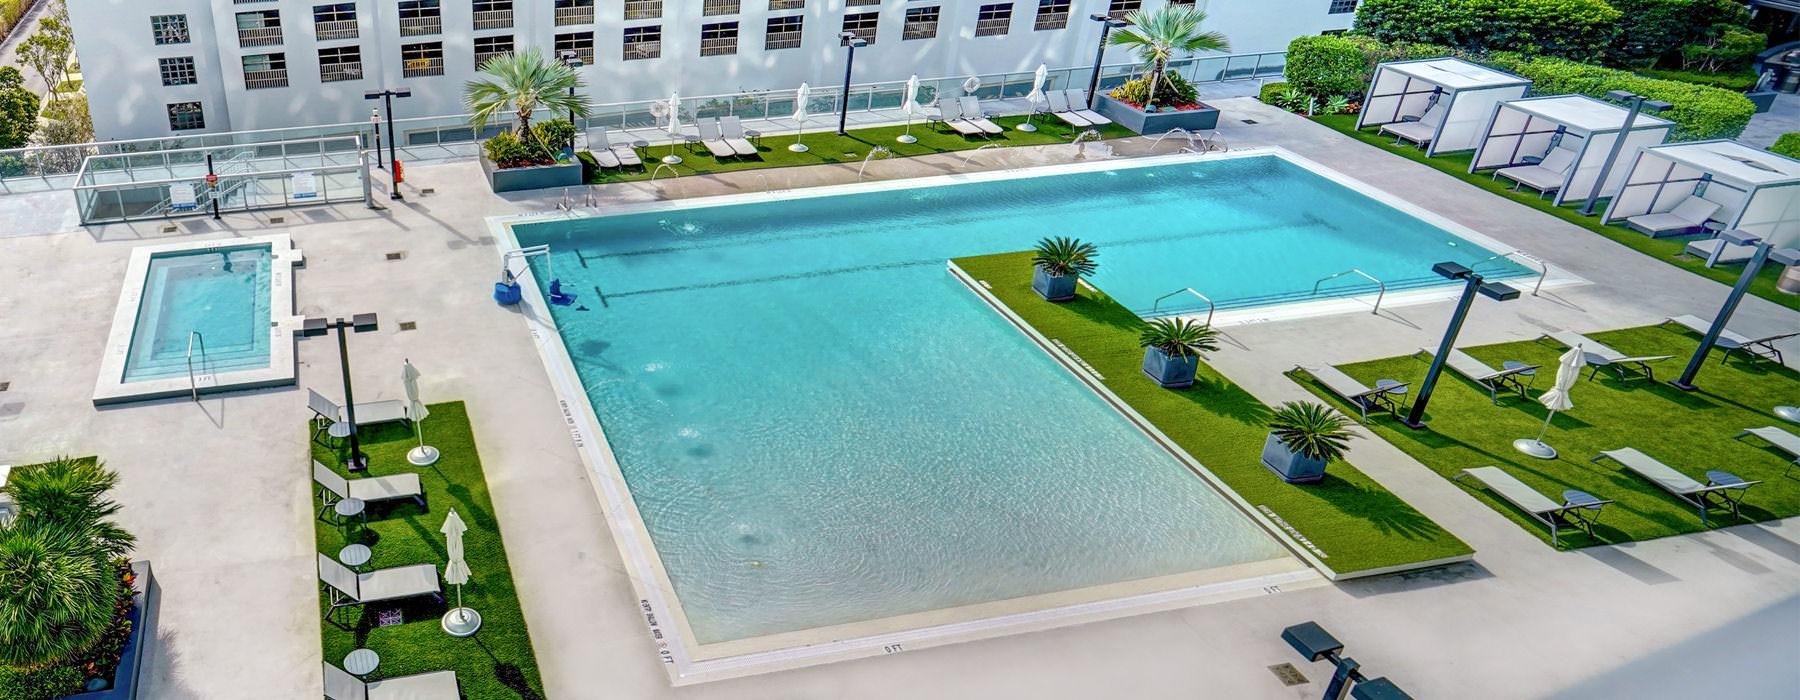 aerial view of zero swimming pool area